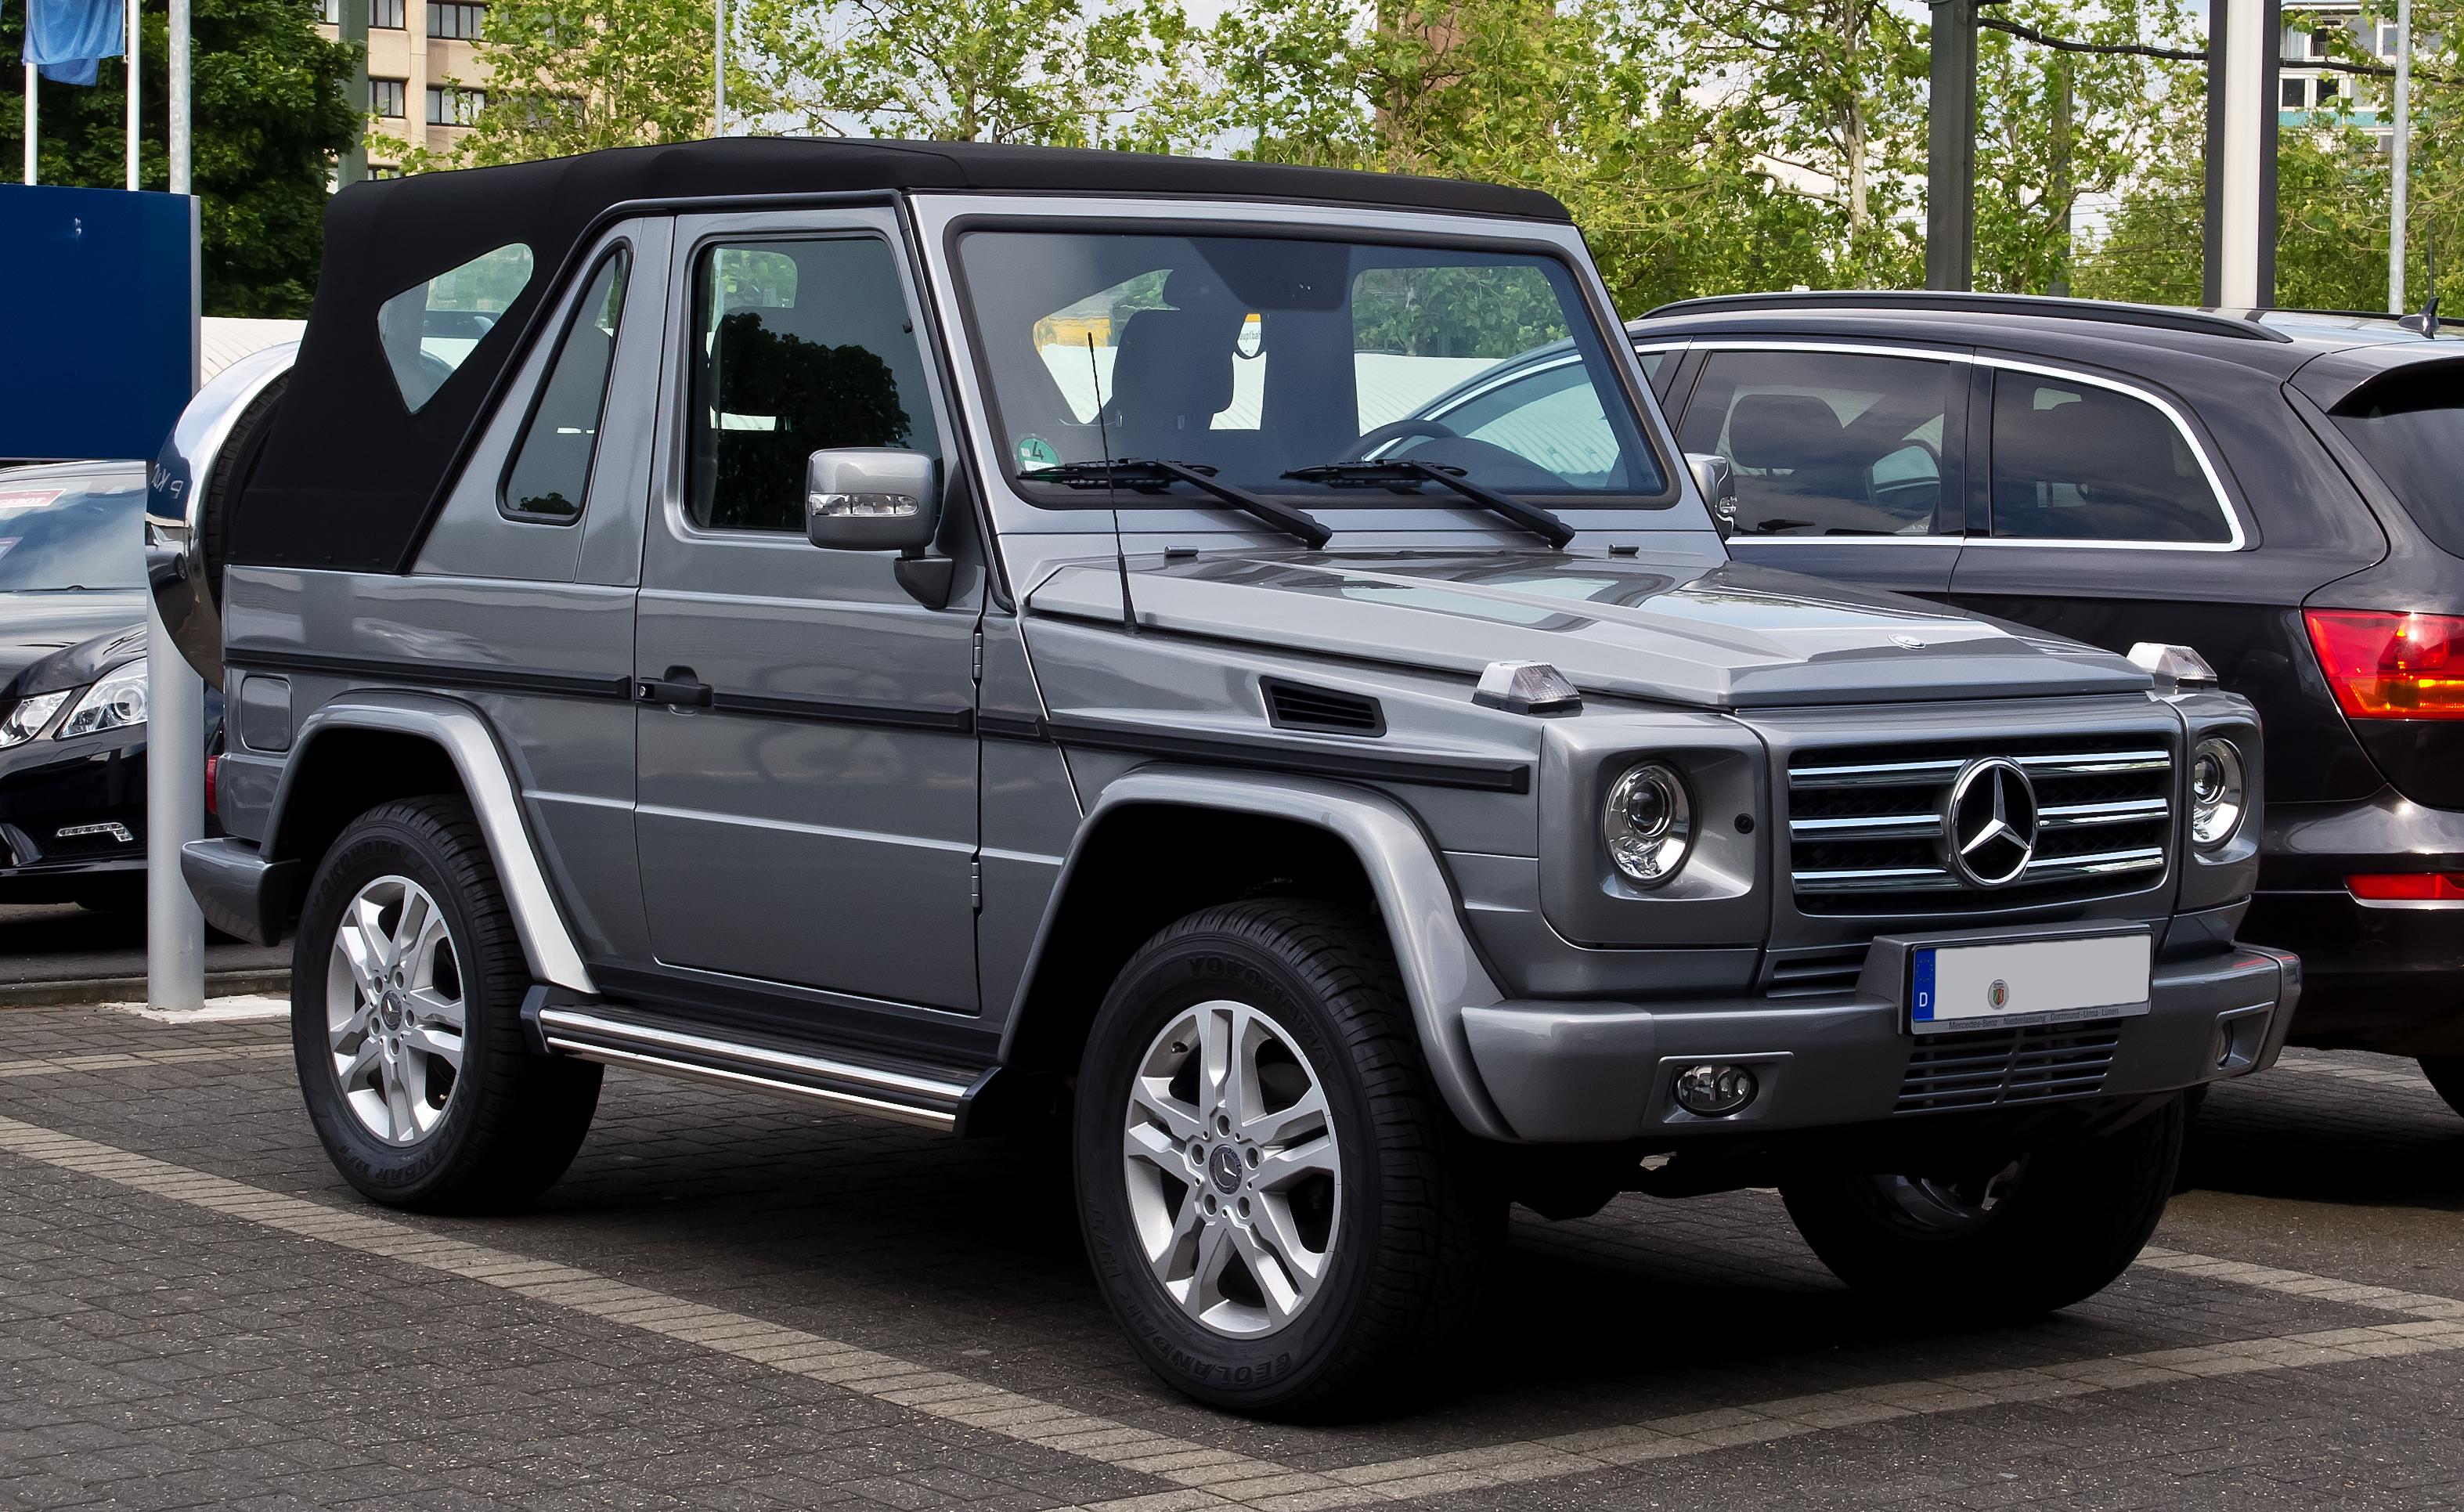 File:Mercedes-Benz G 350 BlueTEC Cabriolet (W 463, 2 ...